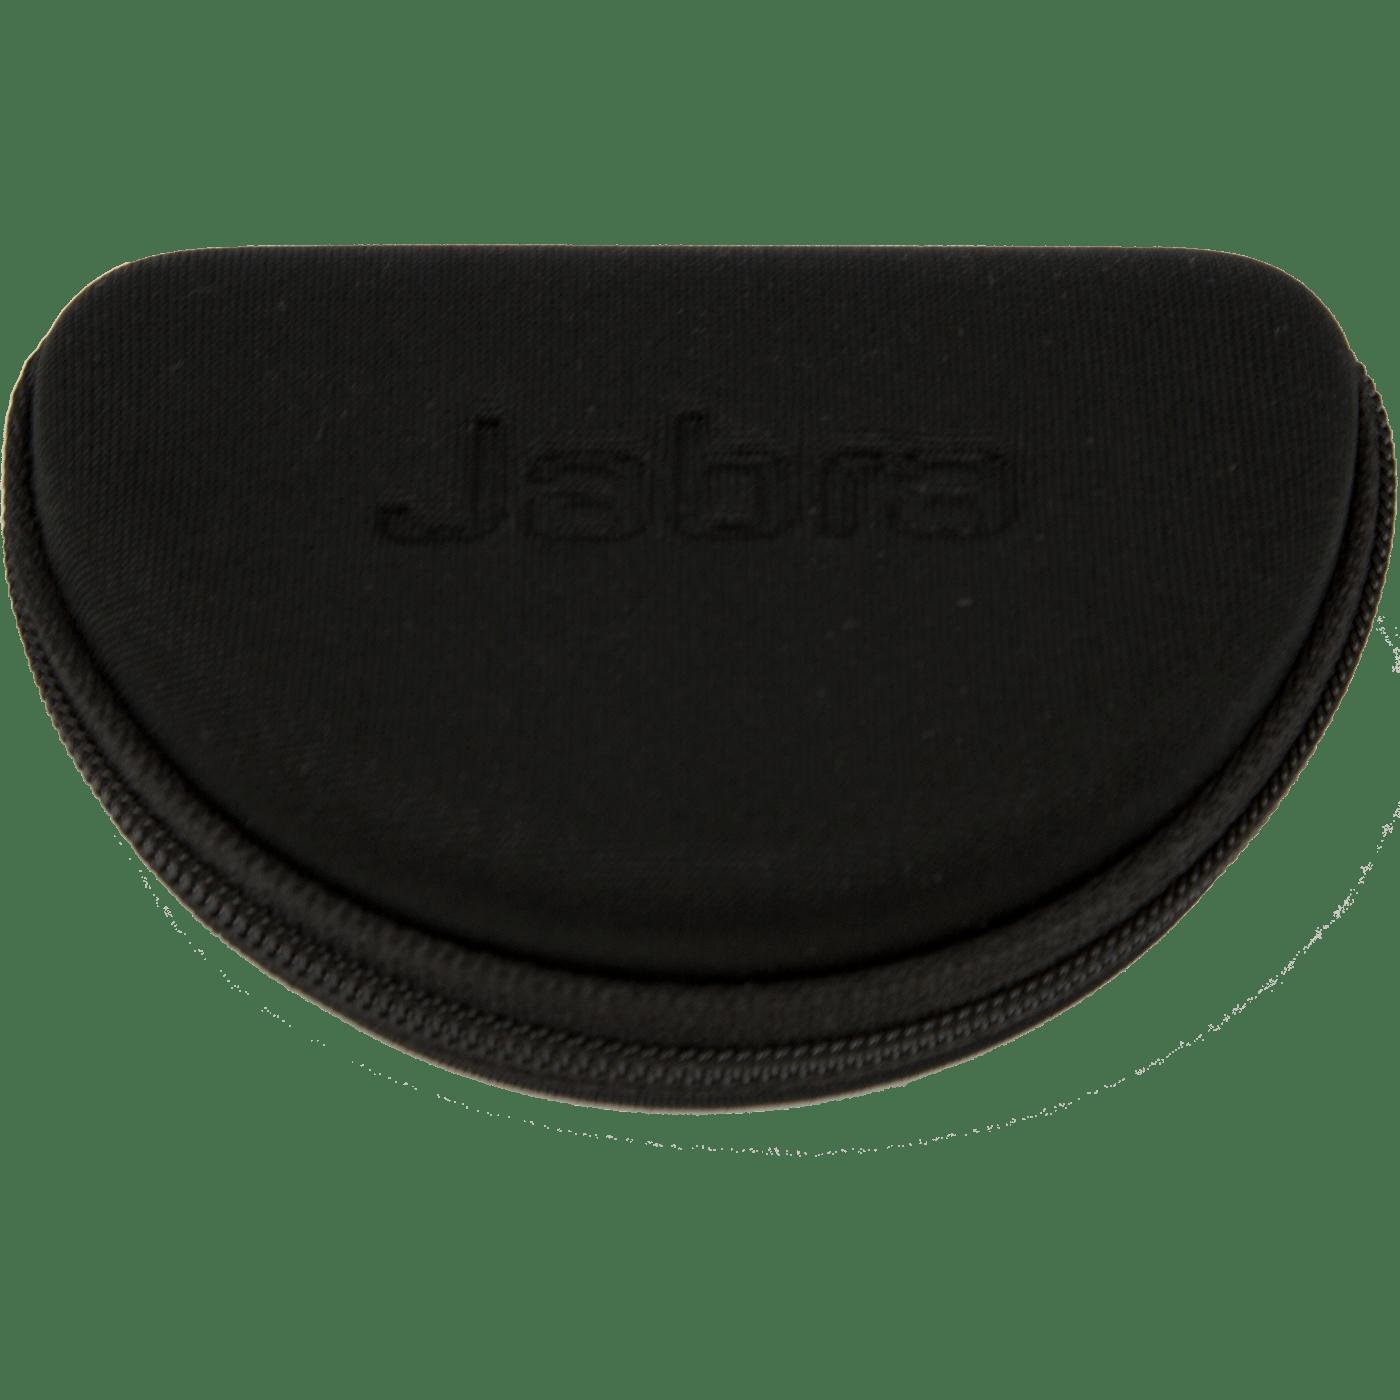 Jabra Motion Headset Pouch